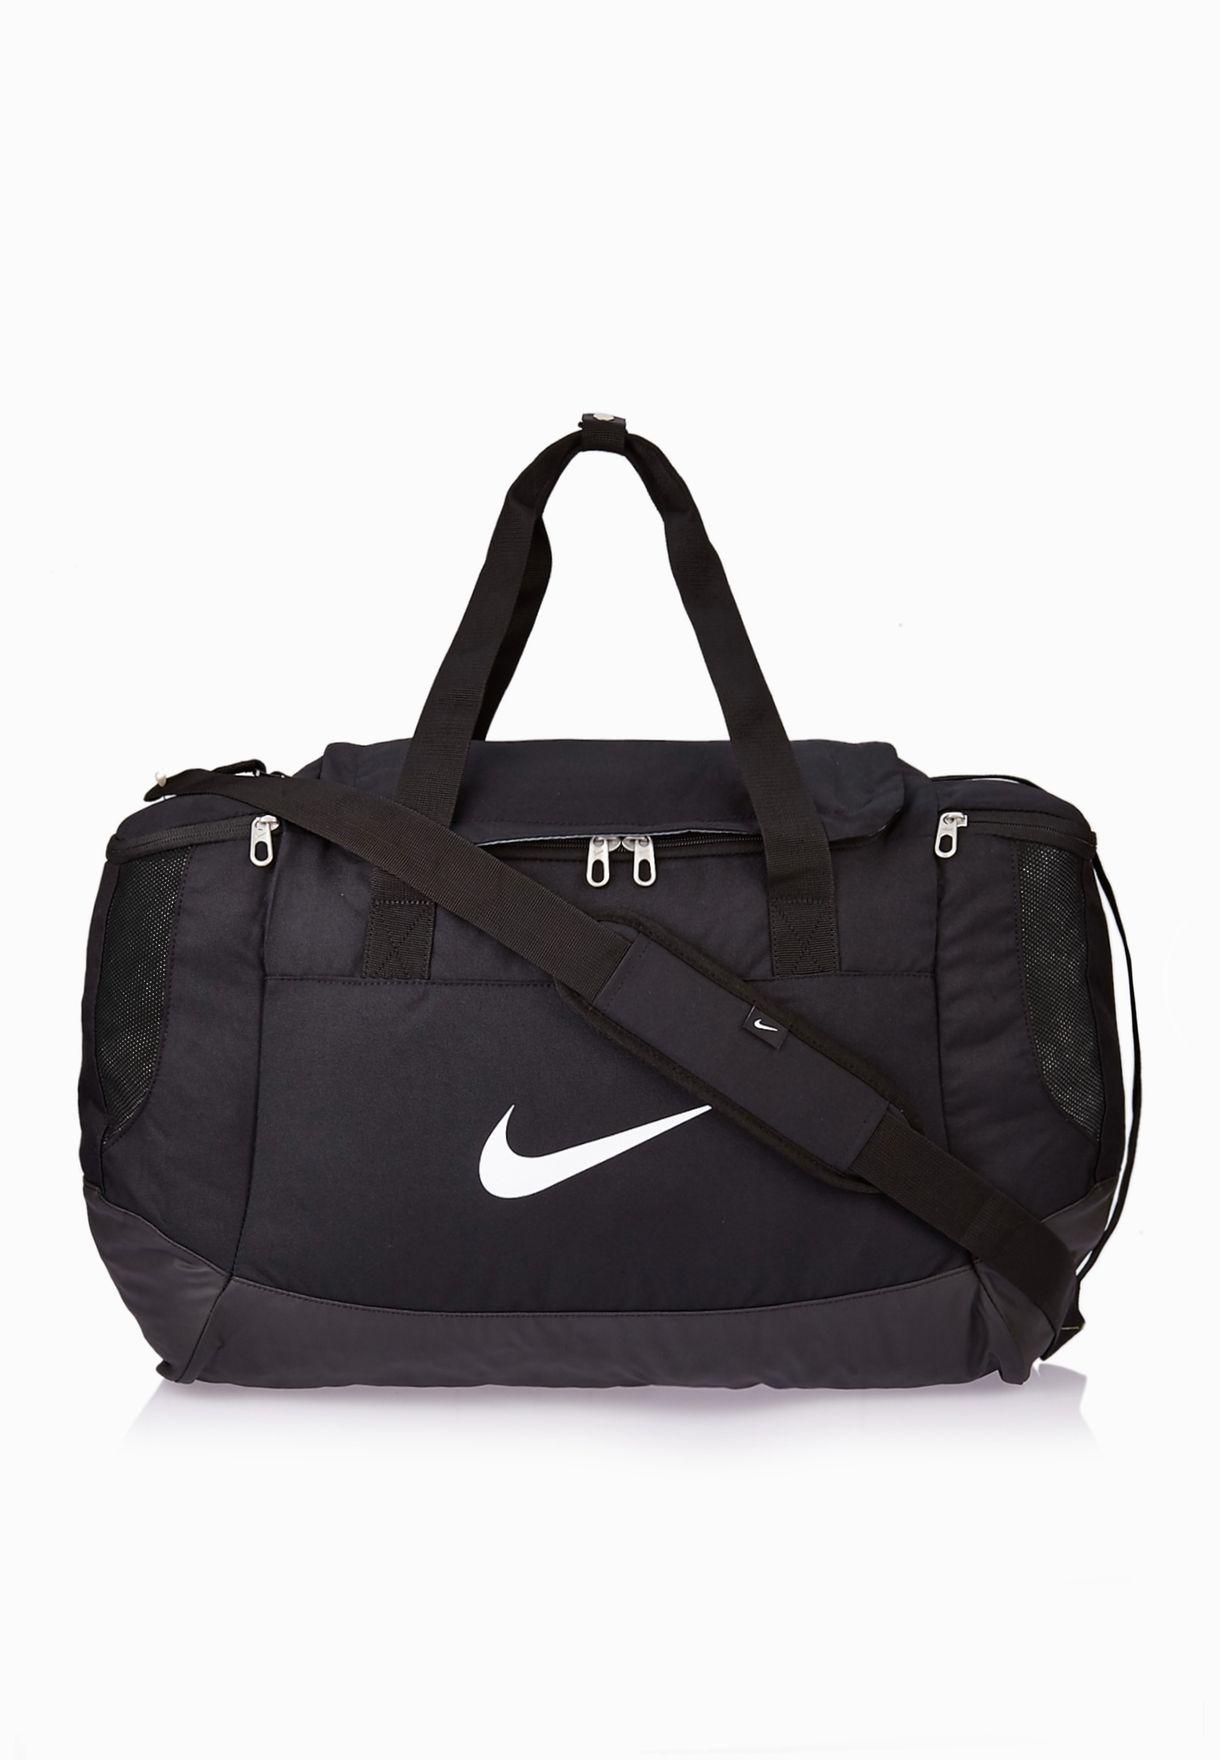 da02b9d7d44cf8 Shop Nike black Medium Club Team Duffel BA5193-010 for Men in UAE ...